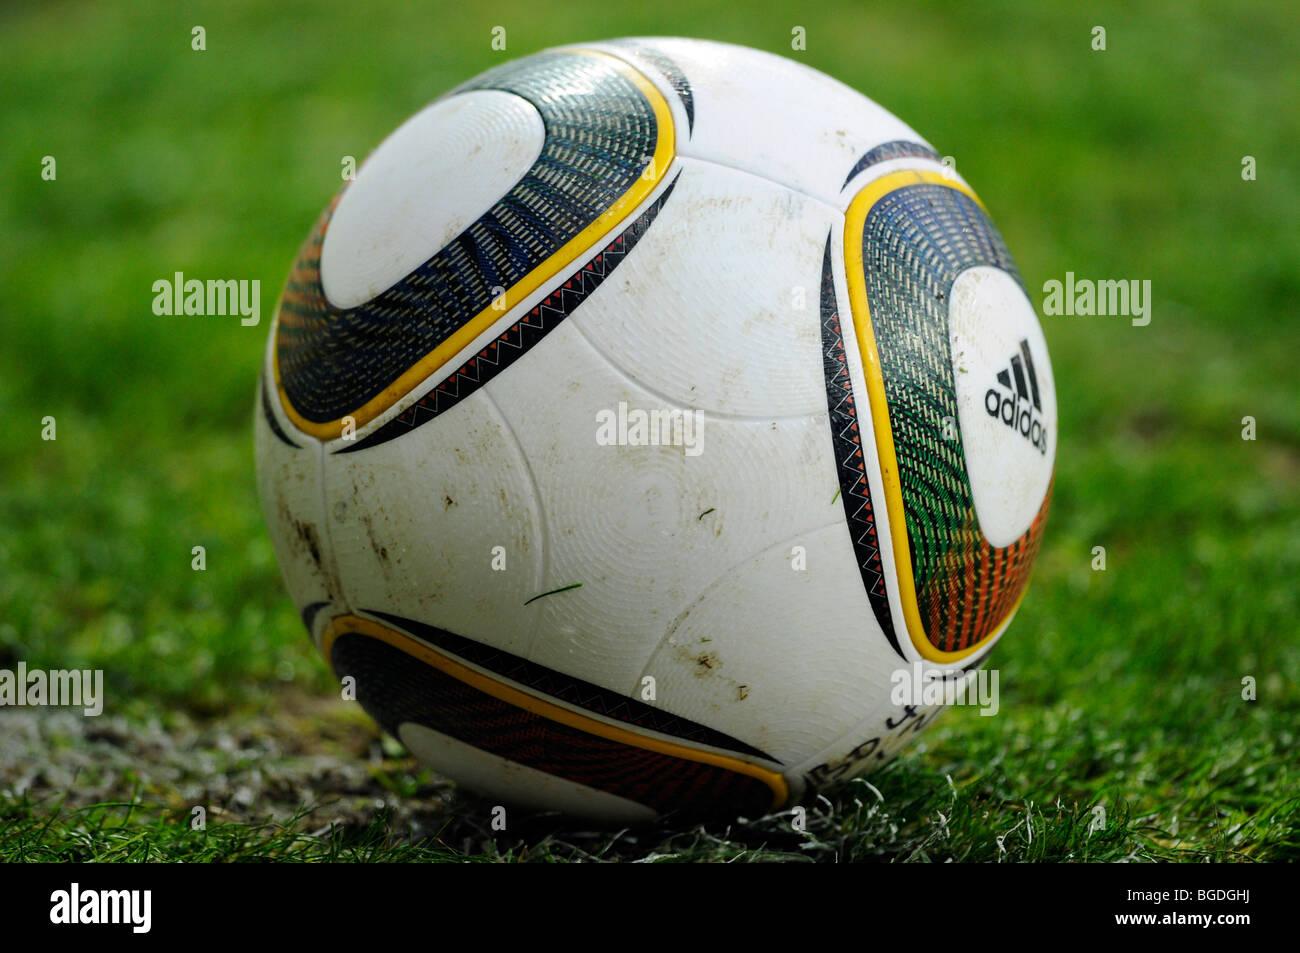 Adidas World Cup Ball Stockfotos Adidas World Cup Ball Bilder Alamy